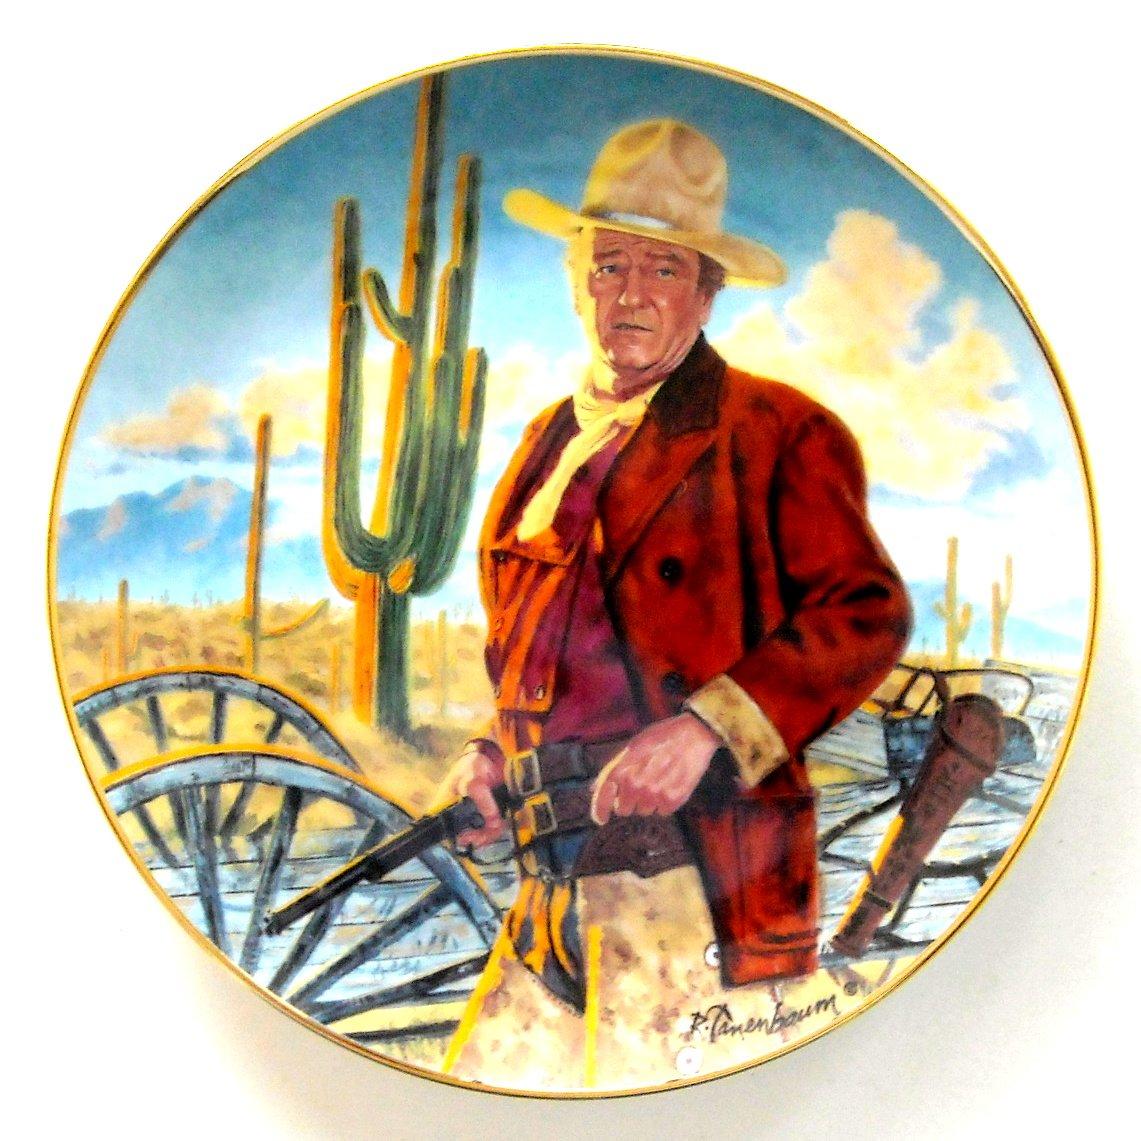 John Wayne Champion Of The West Robert Tanenbaum Franklin Mint fine porcelain plate